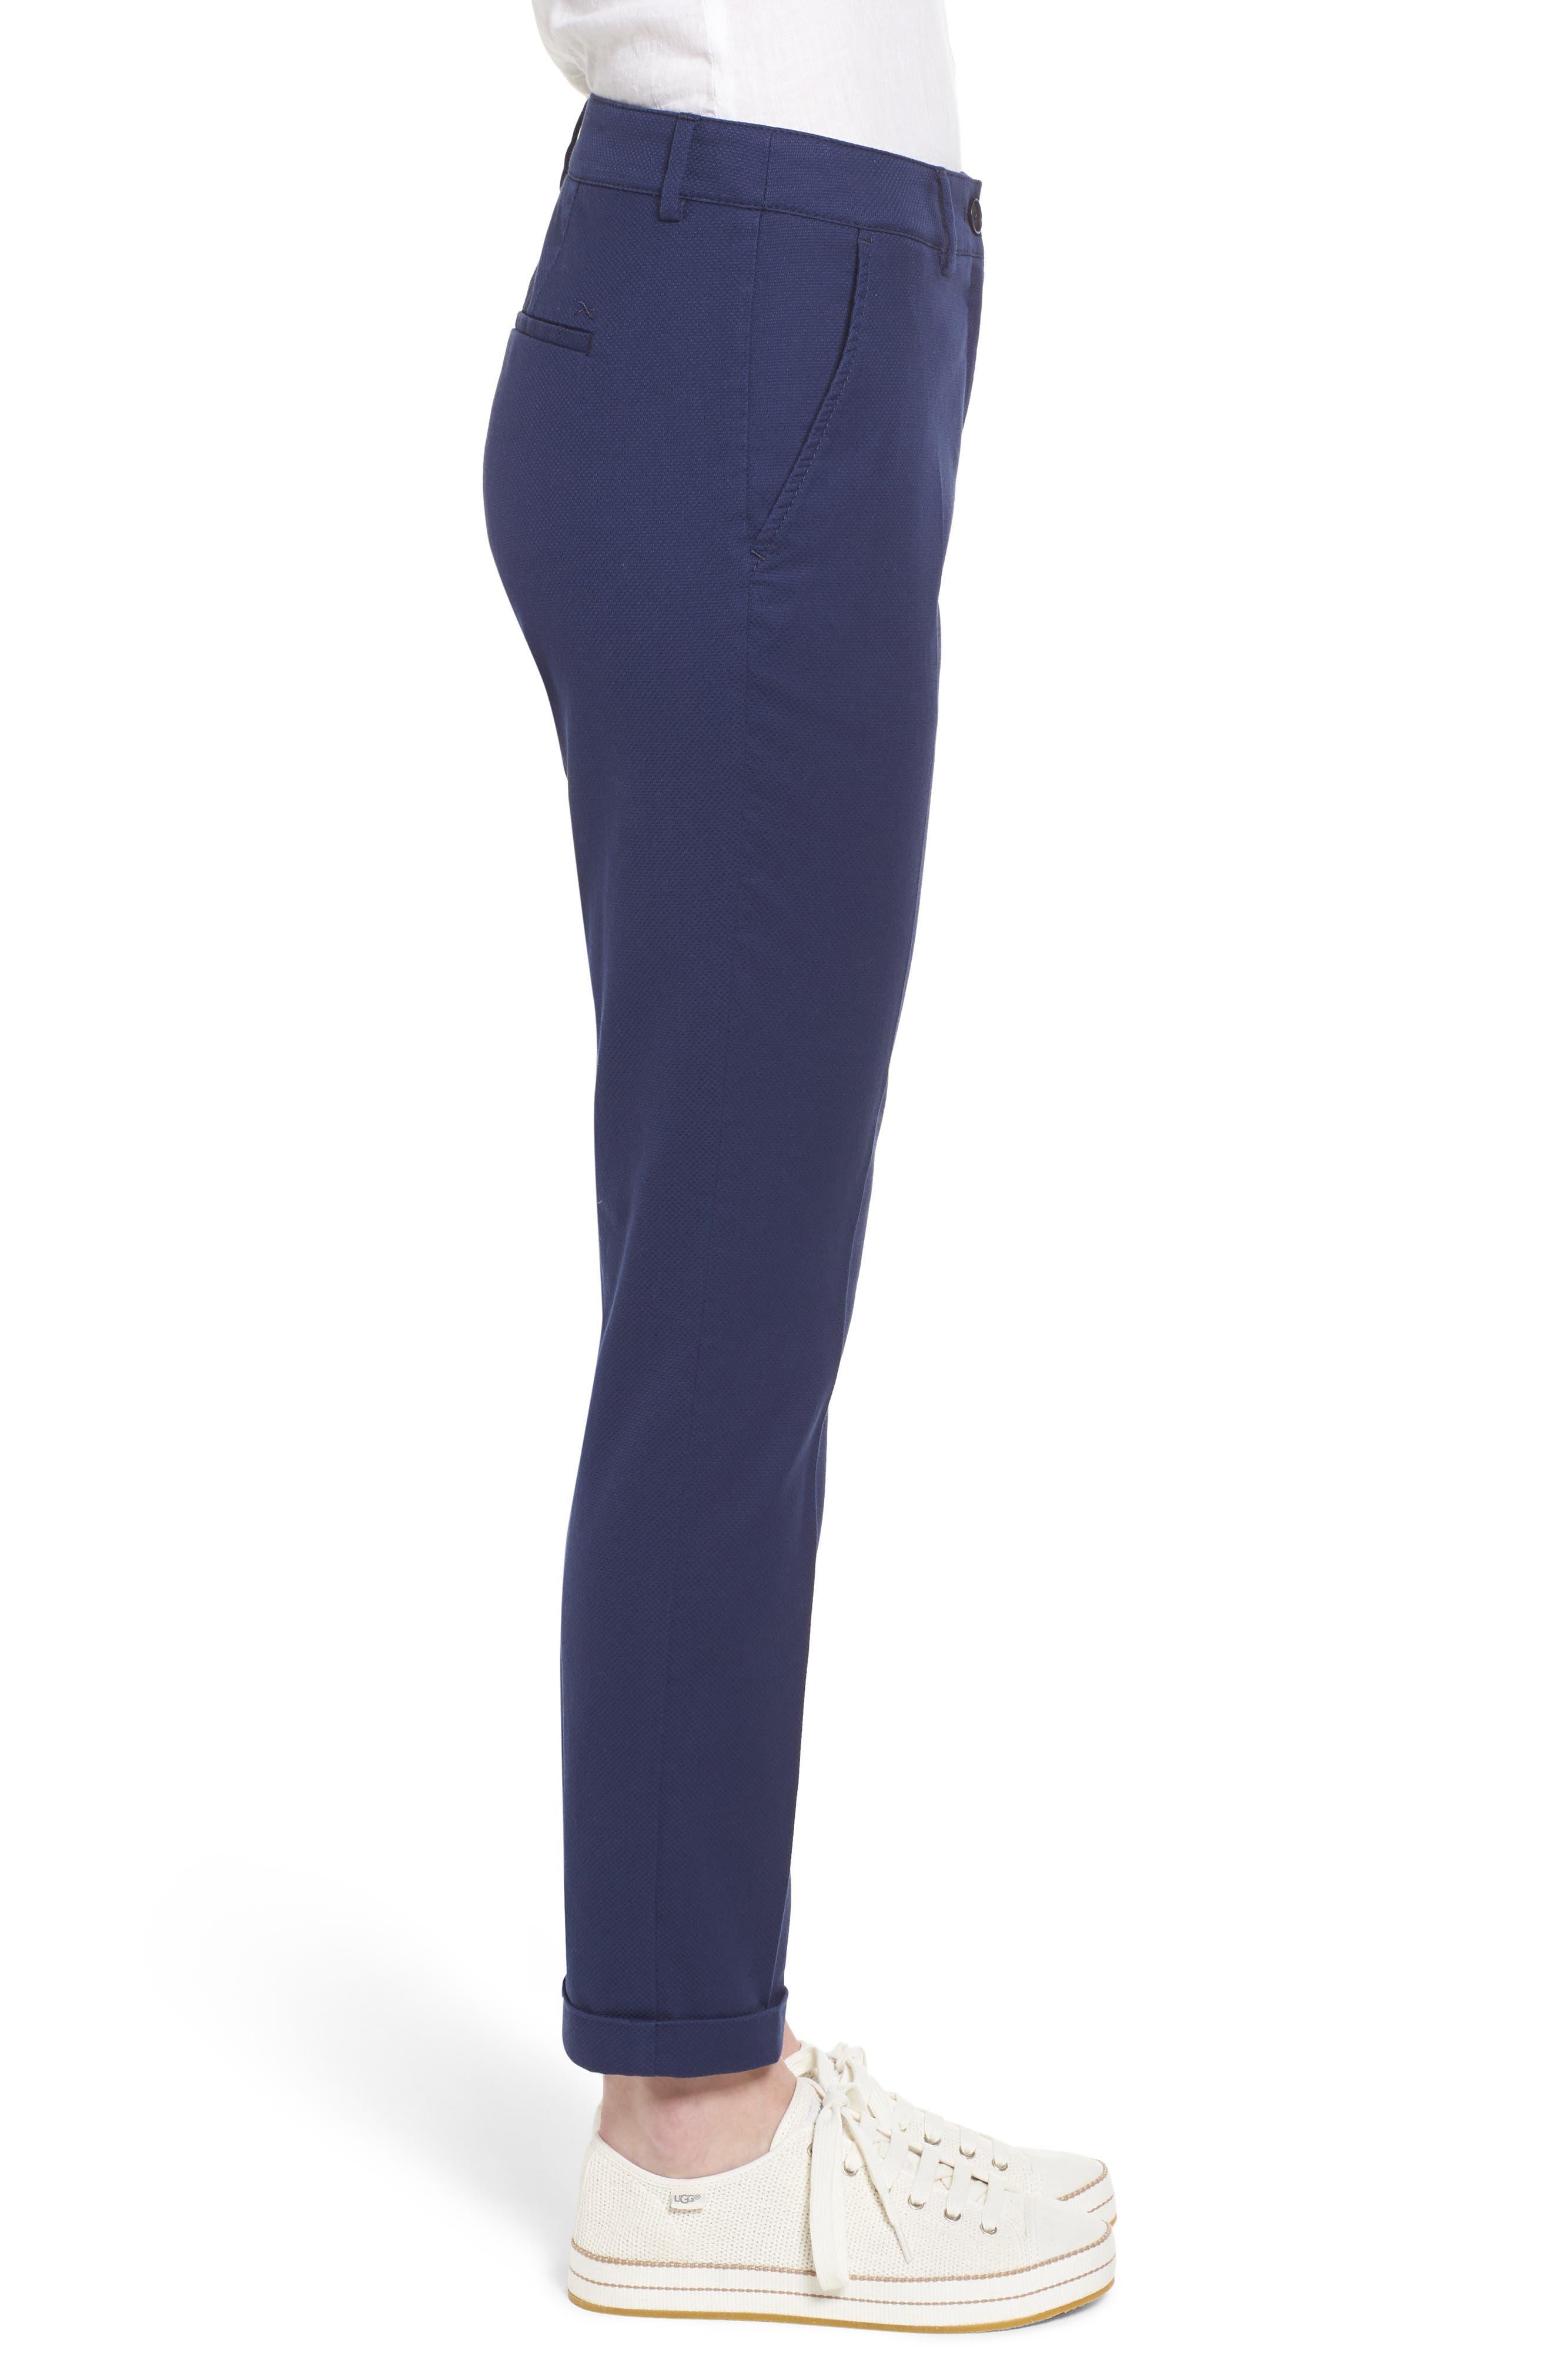 Maron Cuffed Straight Leg Pants,                             Alternate thumbnail 3, color,                             422